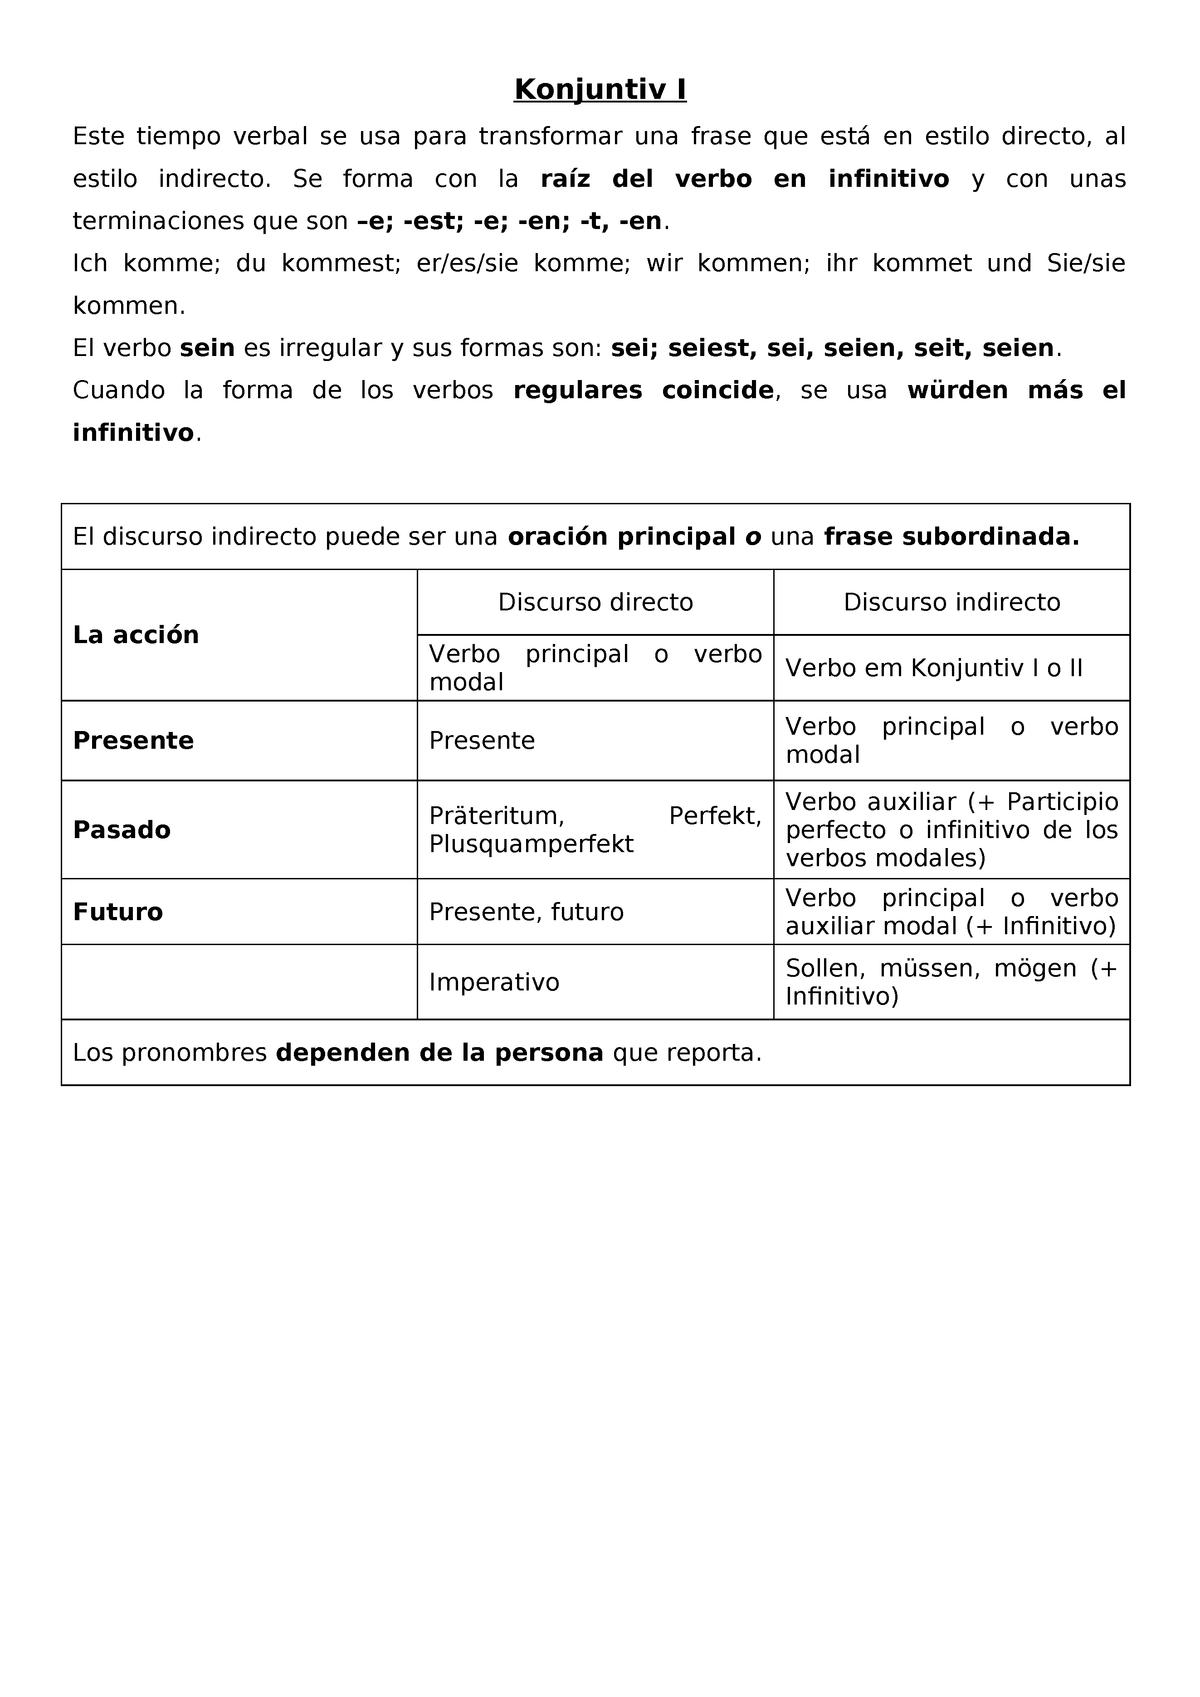 Konjunktiv I Idioma 2 Iv Alemán V01g230v01407 Uvigo